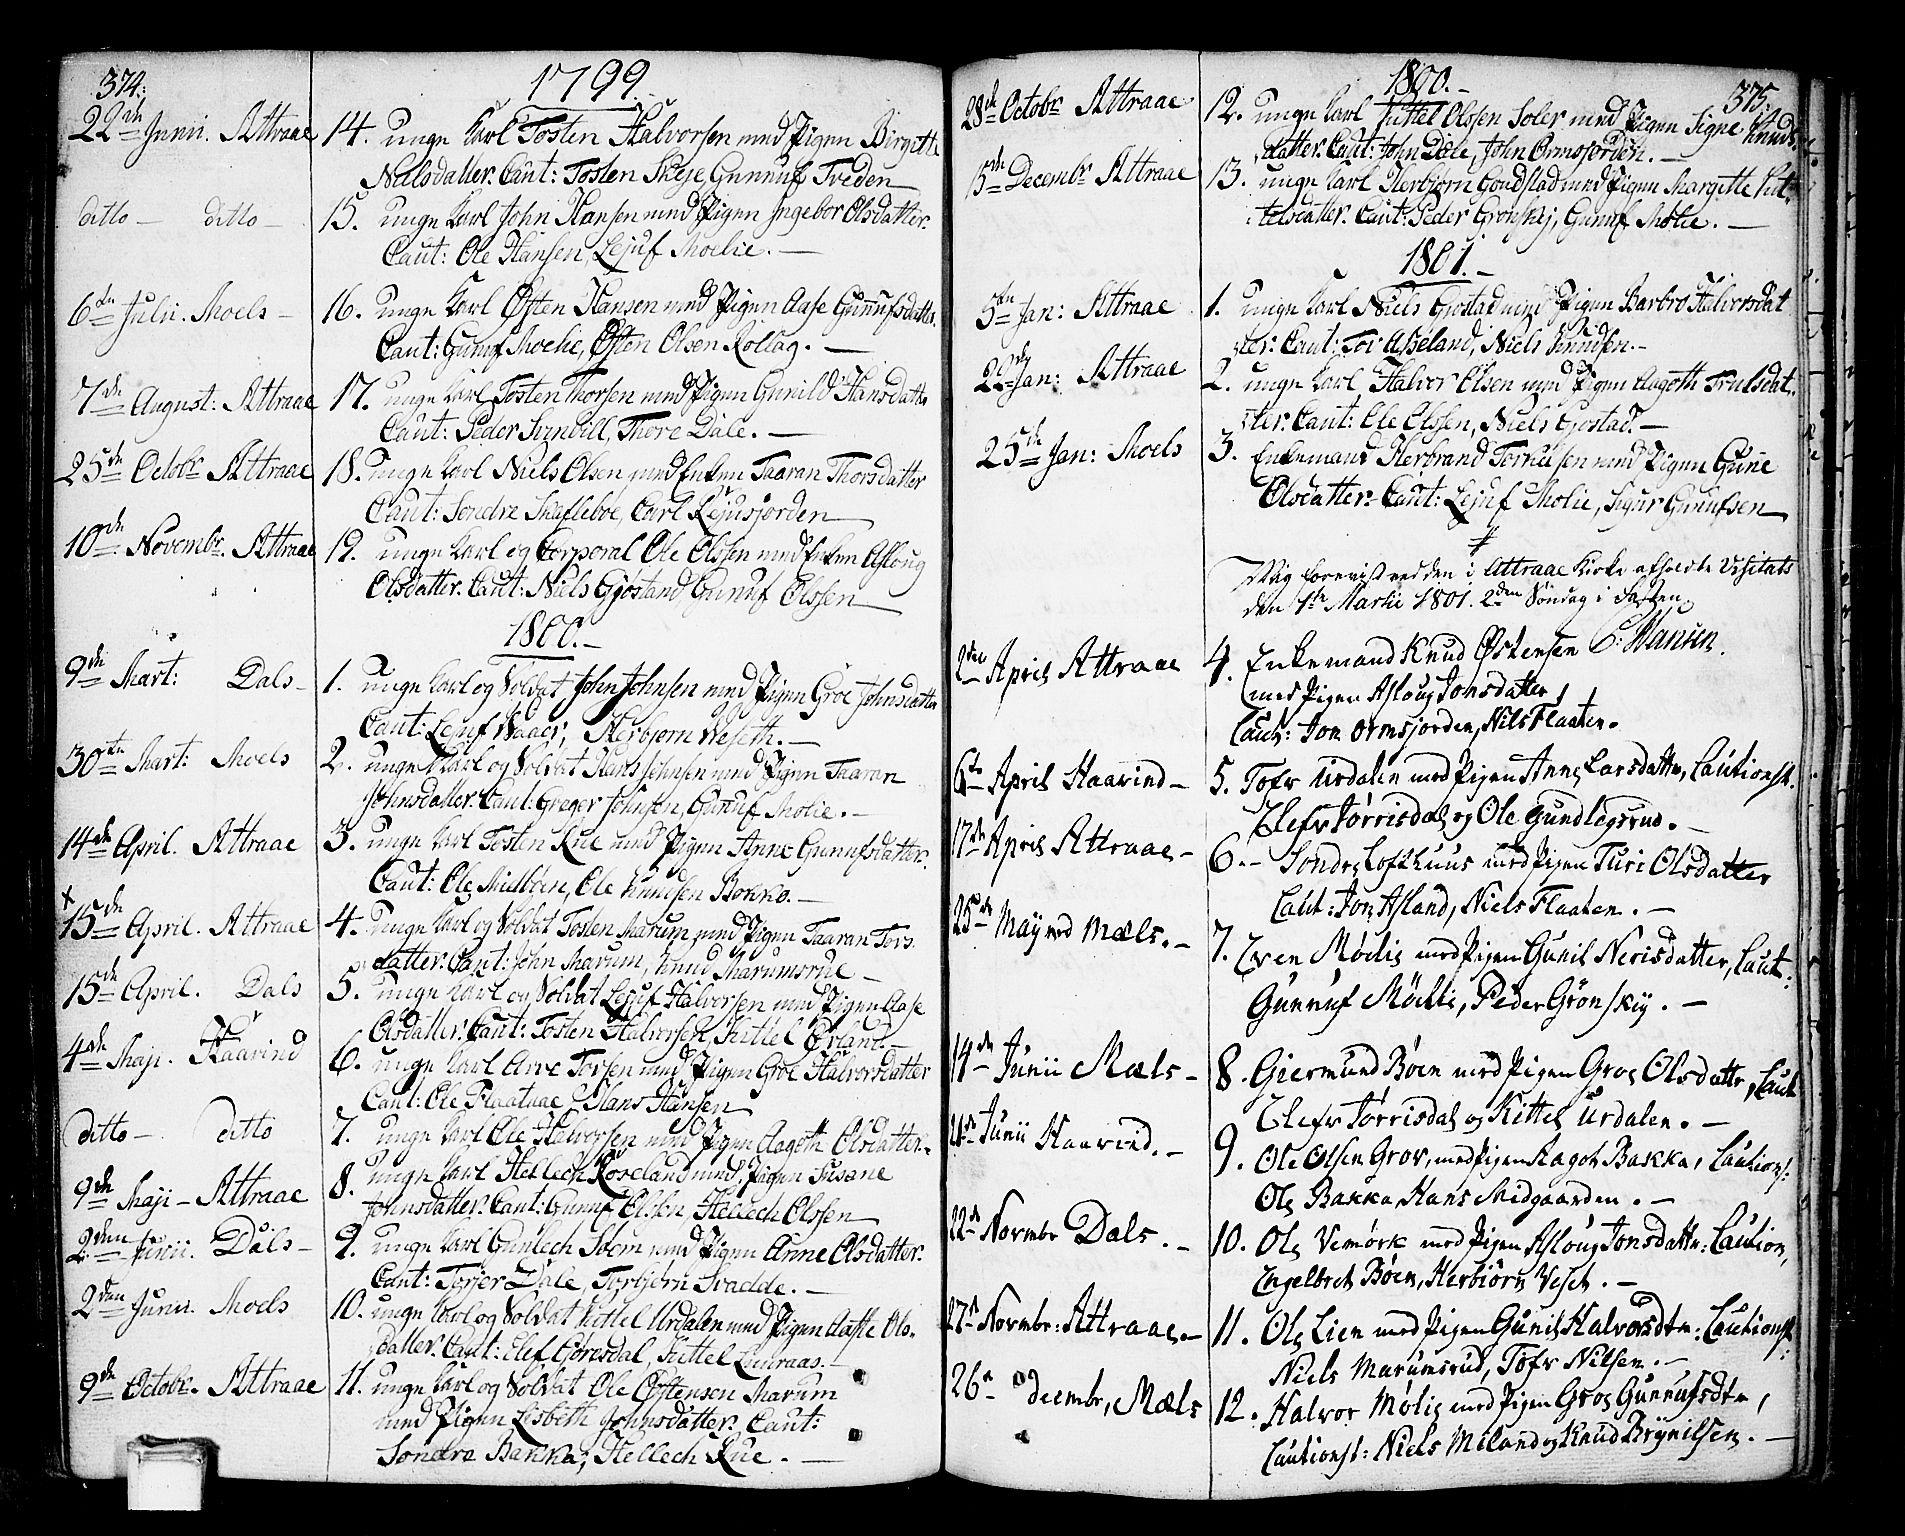 SAKO, Tinn kirkebøker, F/Fa/L0002: Ministerialbok nr. I 2, 1757-1810, s. 374-375